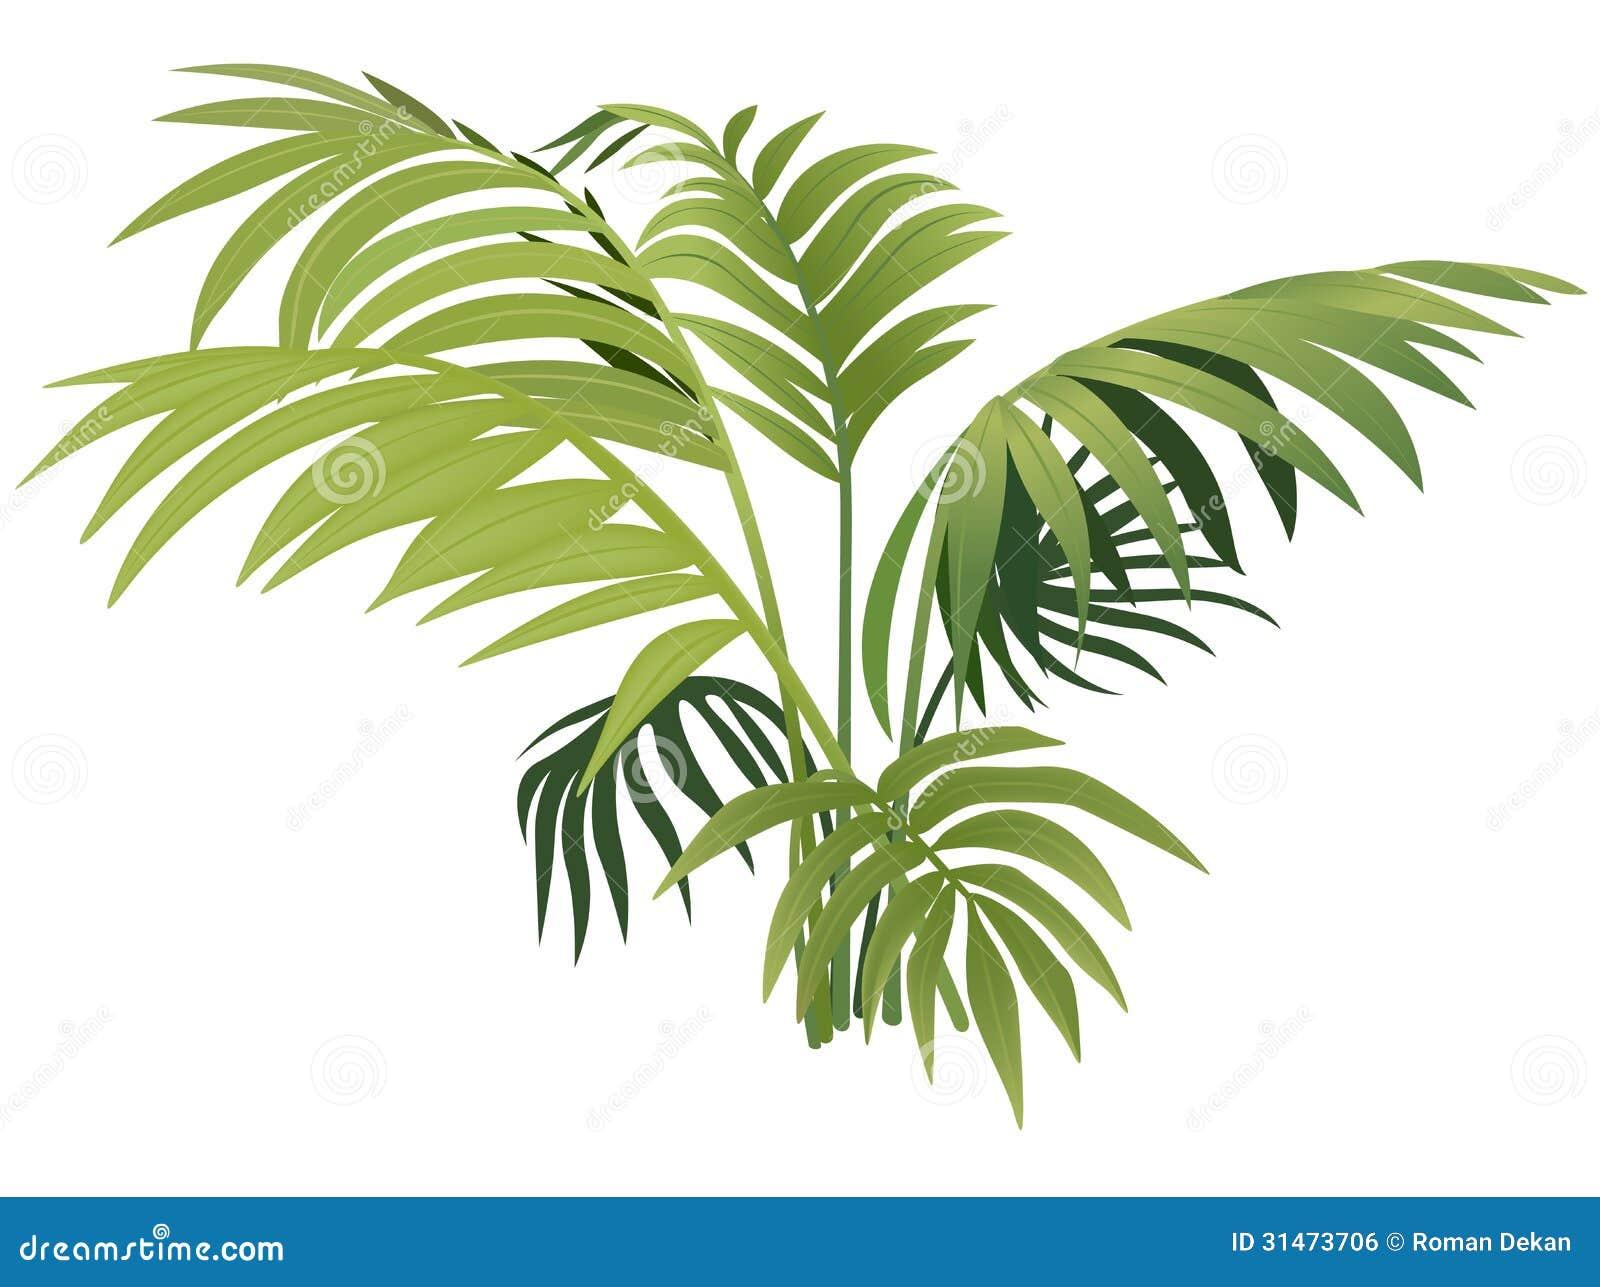 Fern Plant Royalty Free Stock Image - Image: 31473706